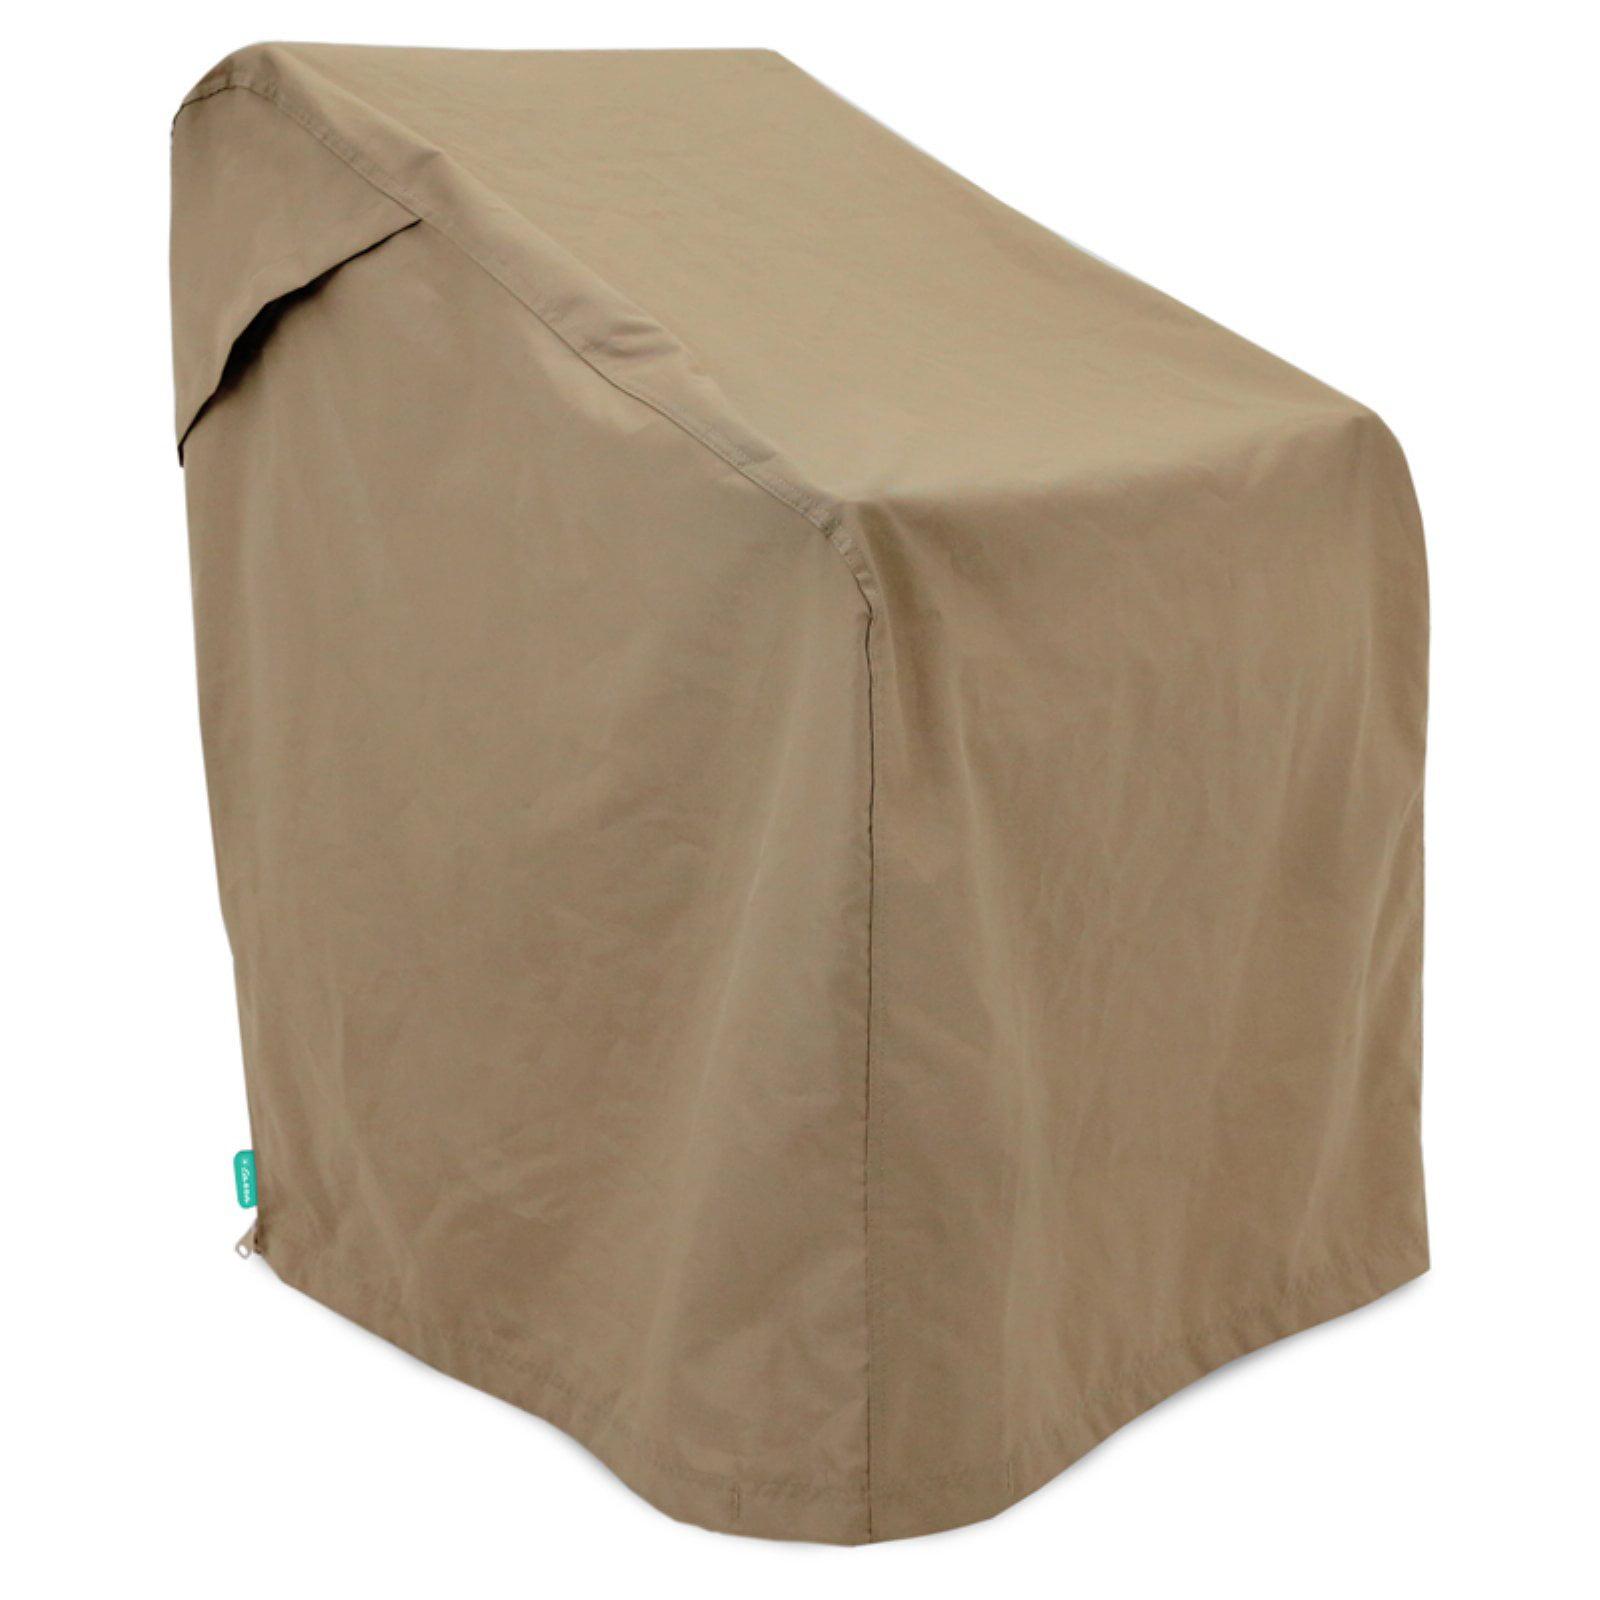 Tarra Home Universal Outdoor UFCCP394437PT Patio Chair Cover